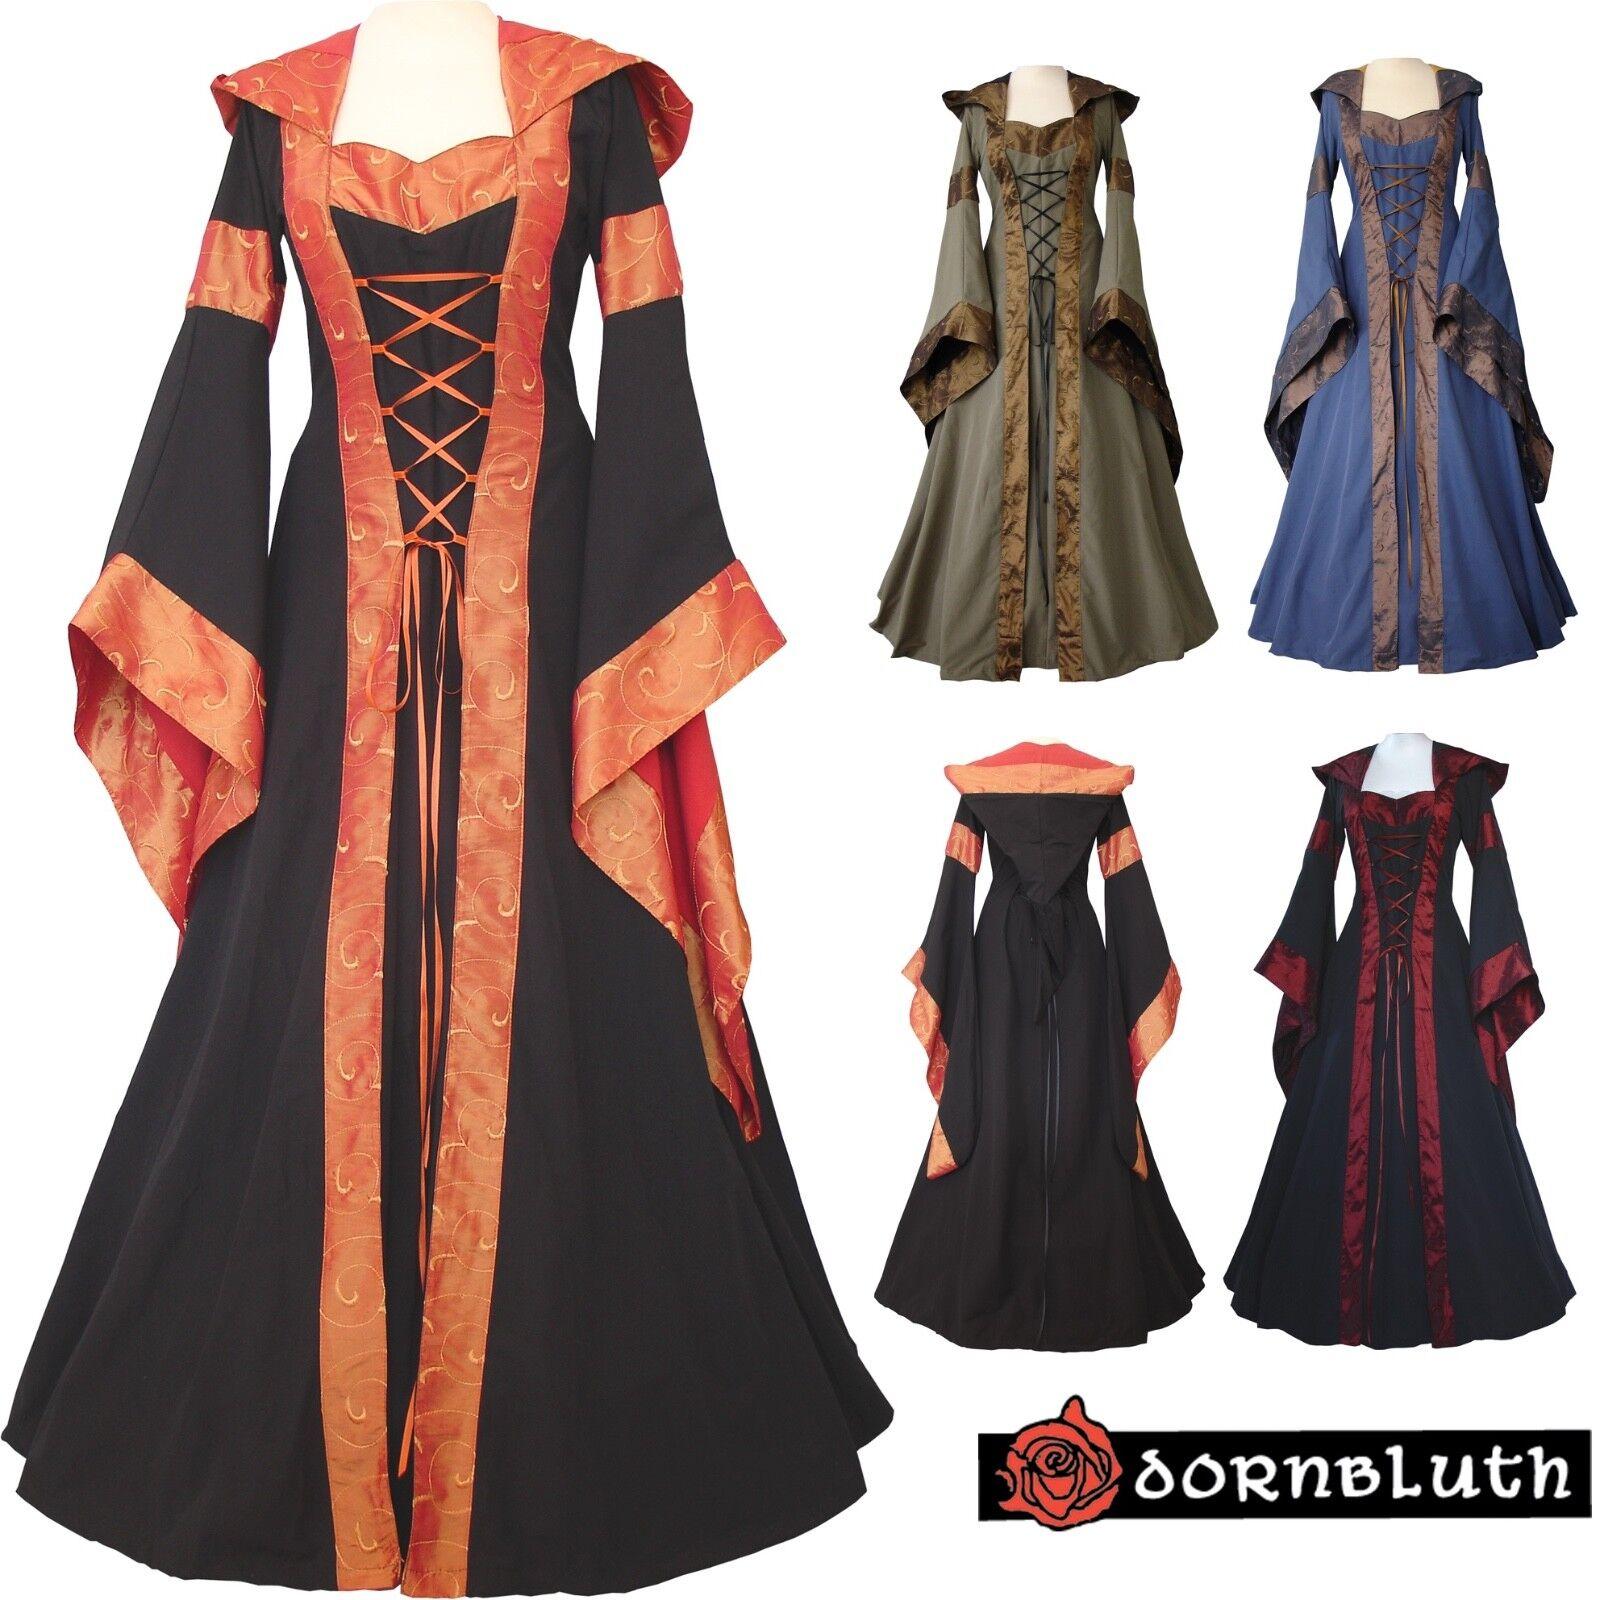 Mittelalter Gothik Karneval Kleid Gewand Kostüm Maria Maßanfertigung Farbwahl